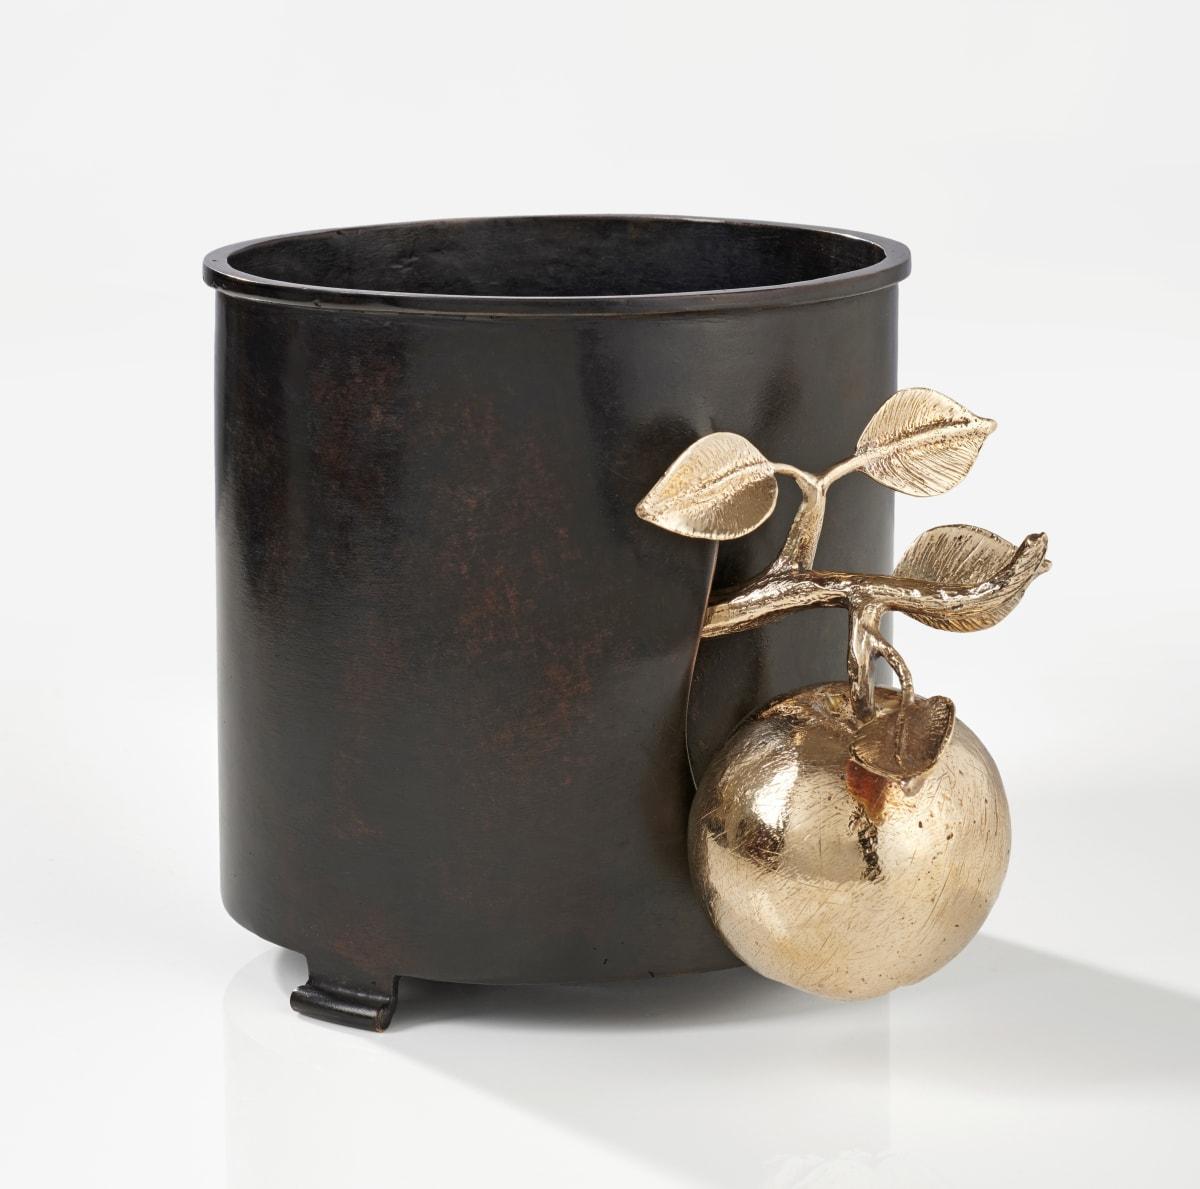 Hubert Le Gall, Pomone Pot, 2017